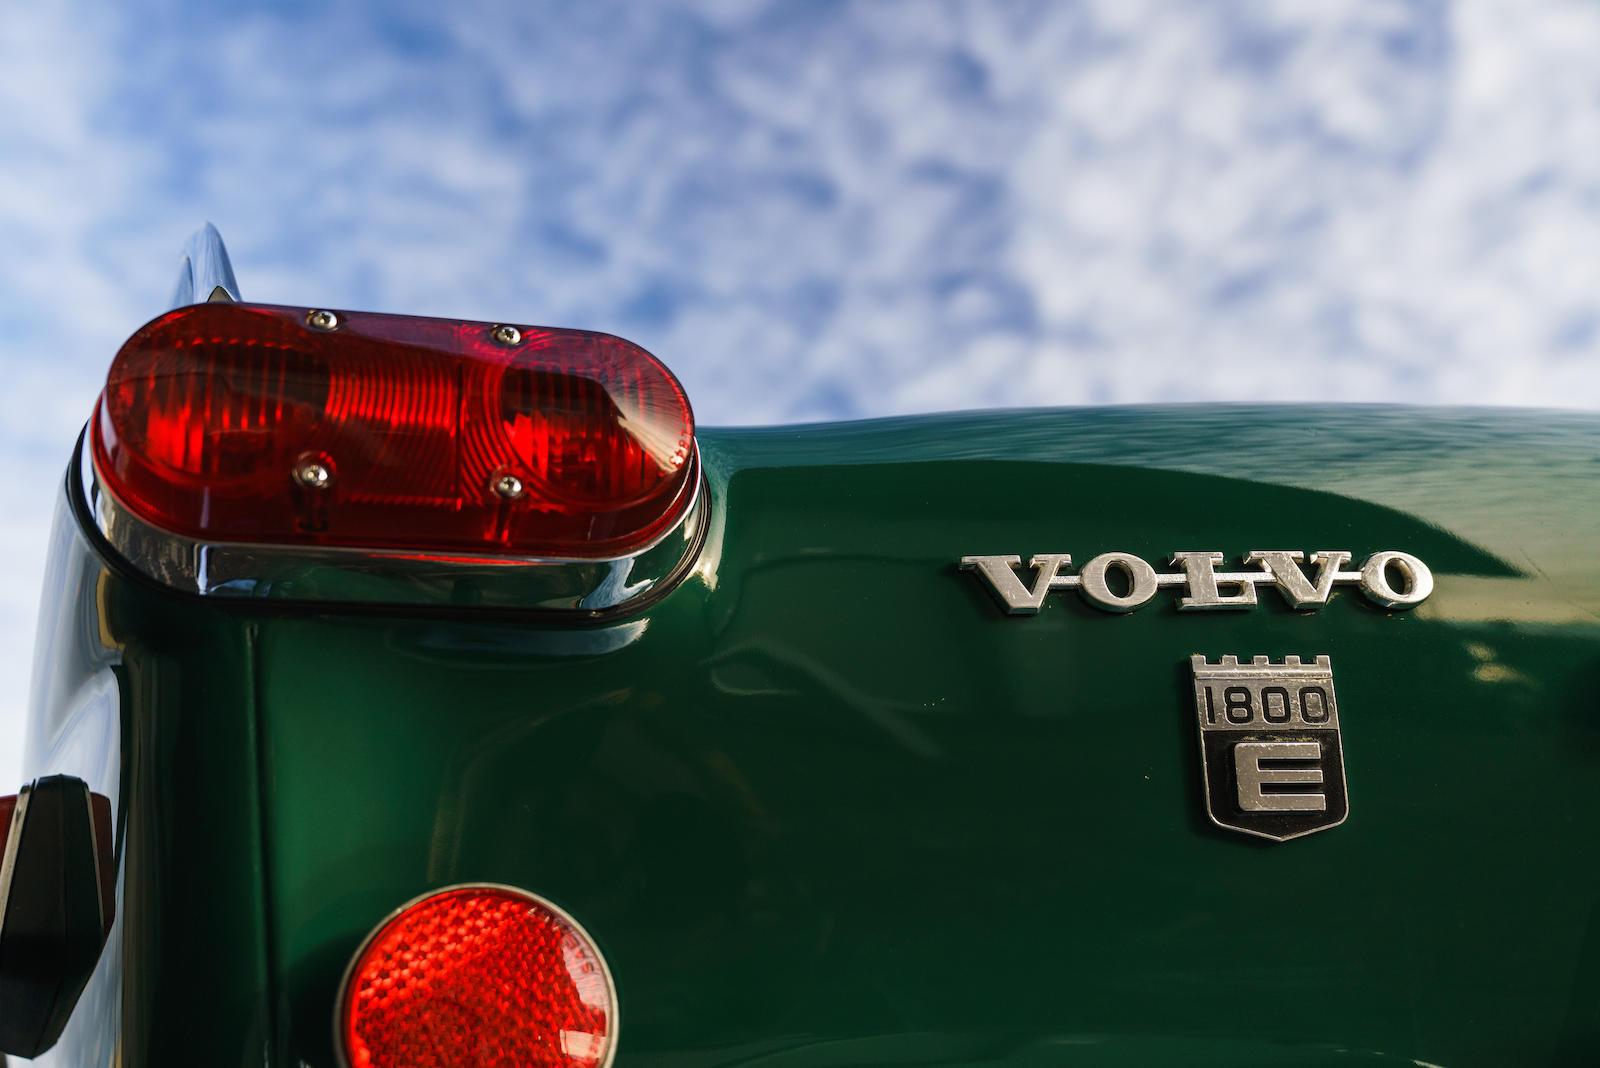 1972 Volvo 1800E tail light